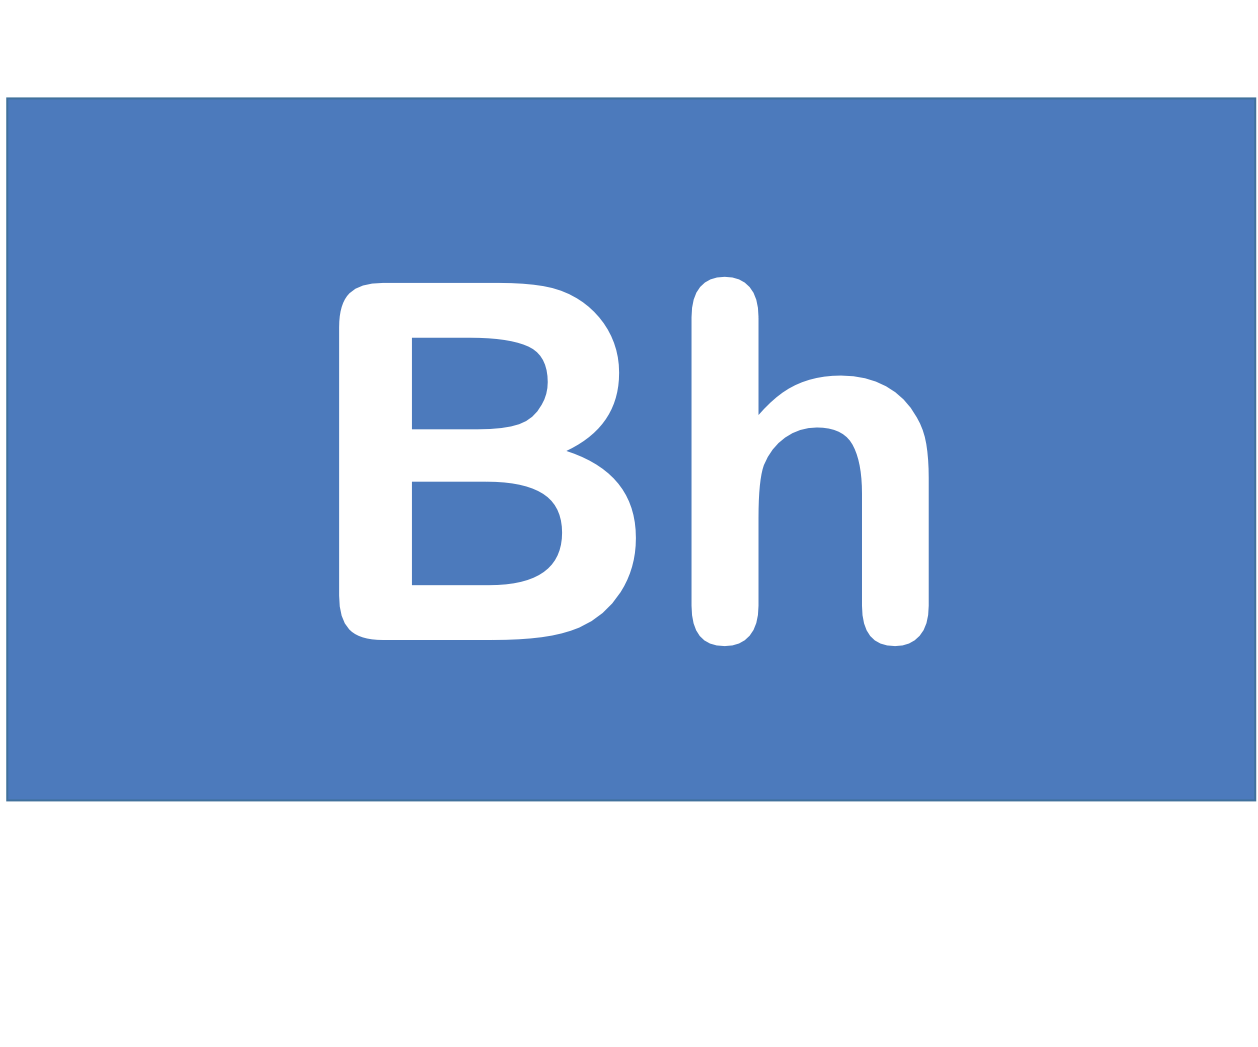 107 Bh ボーリウム Bohrium 元素 記号 周期表 化学 原子